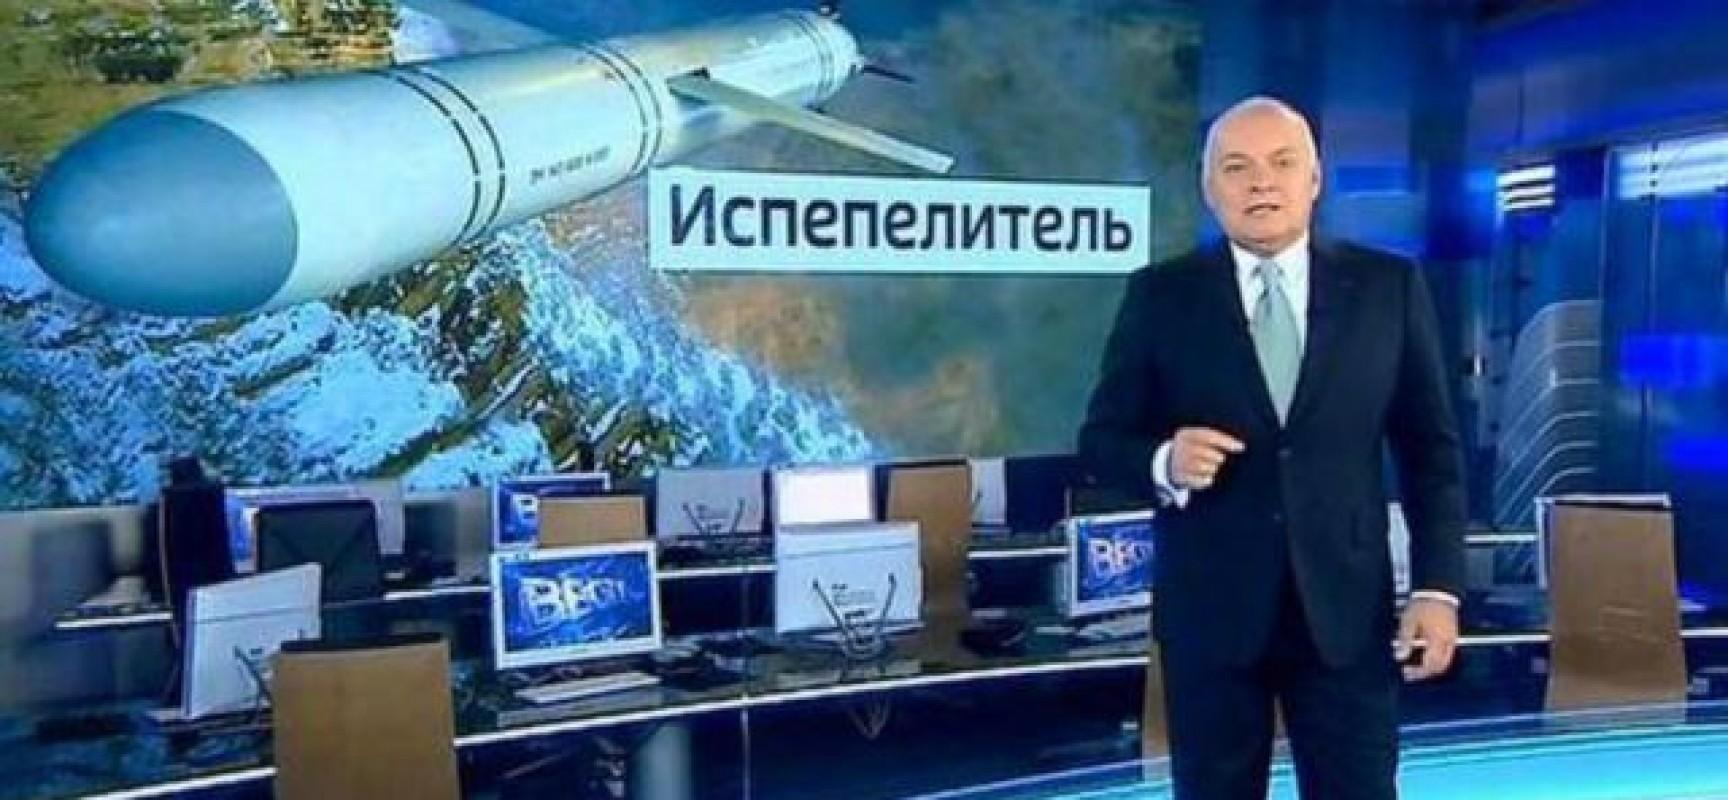 Dmitry Kiselyov attacca (nuovamente) l'Ucraina